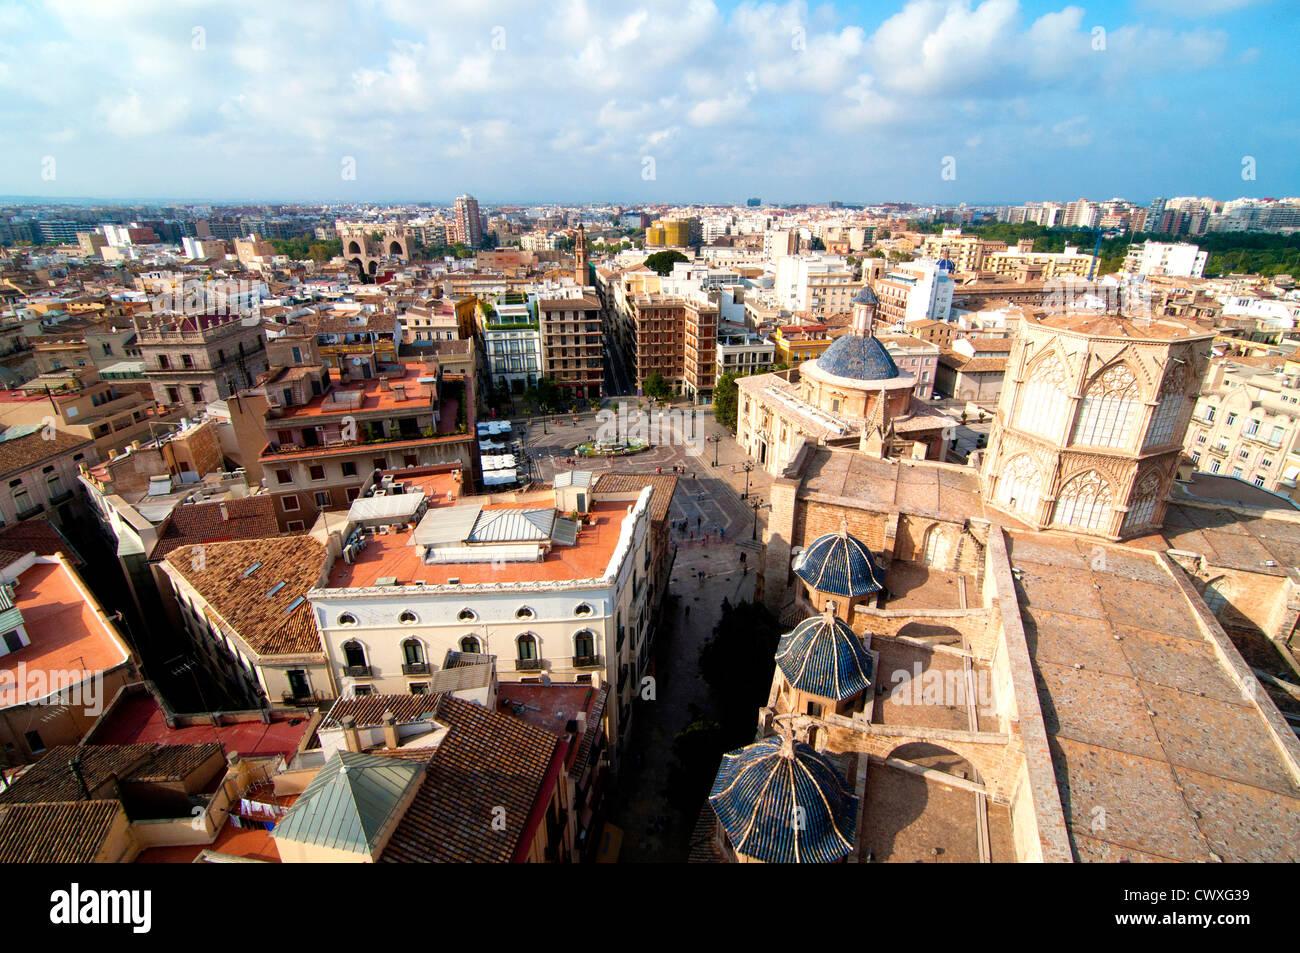 View of Plaza de la Virgen taken from El Miguelete, Valencia, Spain Stock Photo